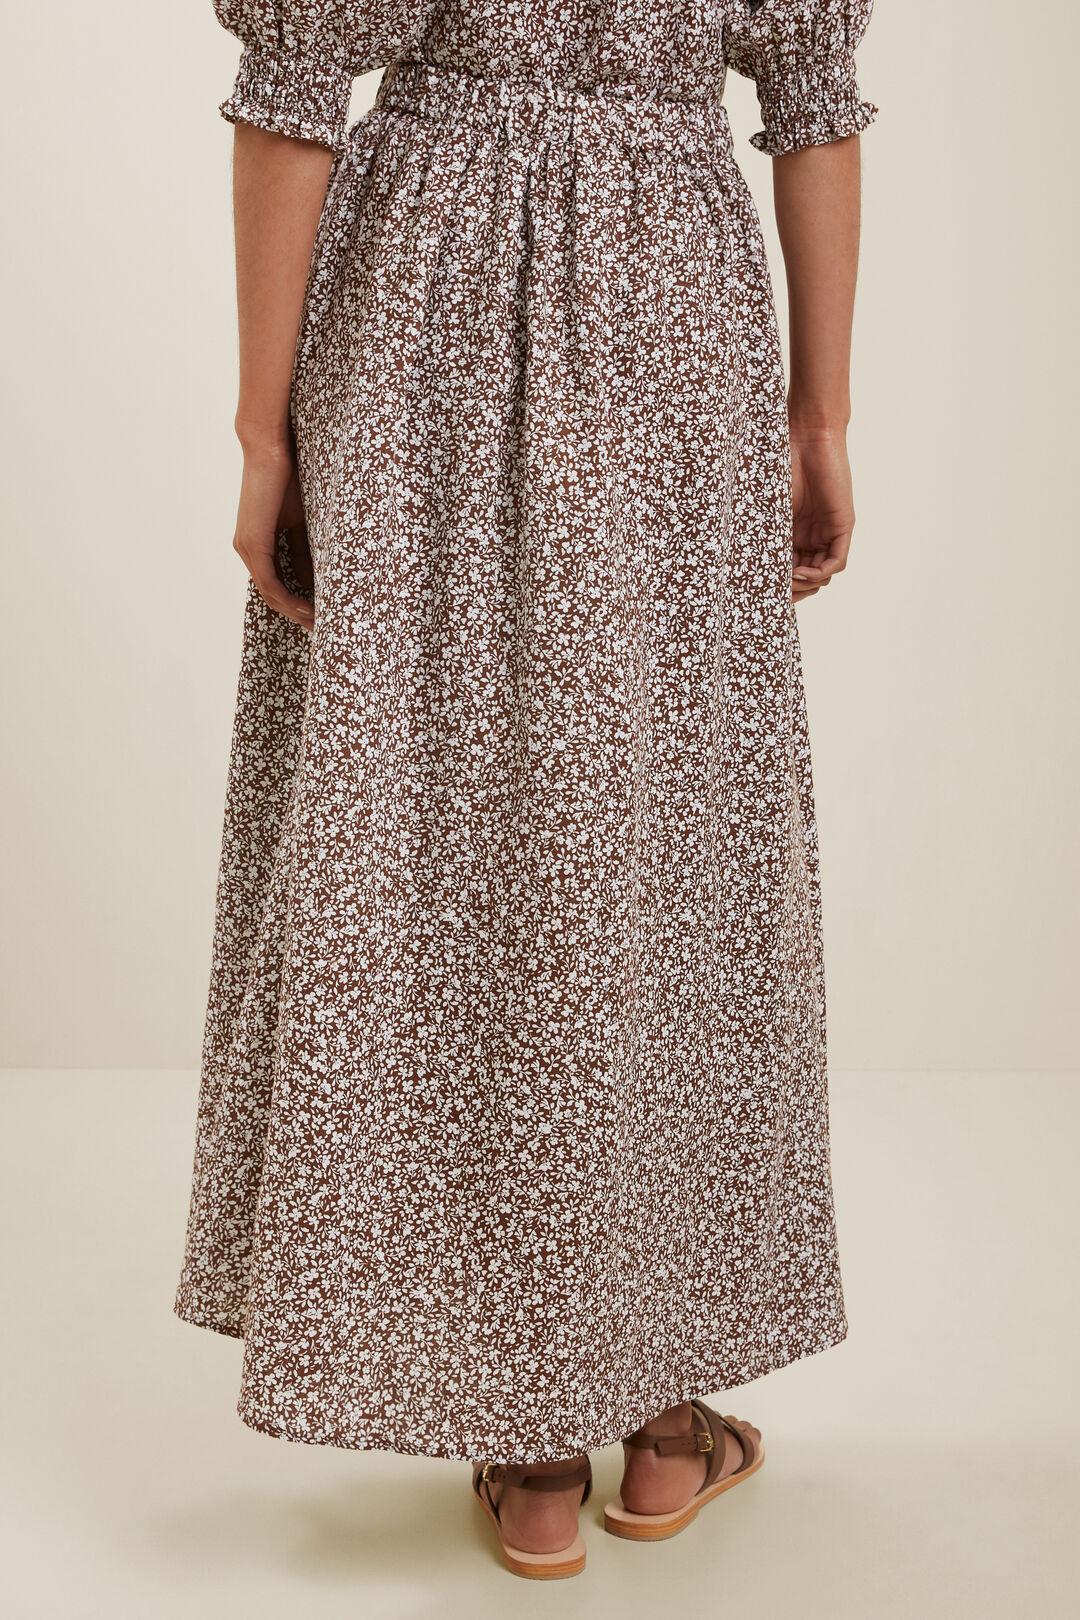 Linen Ditsy Maxi Skirt  RUSSET BROWN DITSY  hi-res